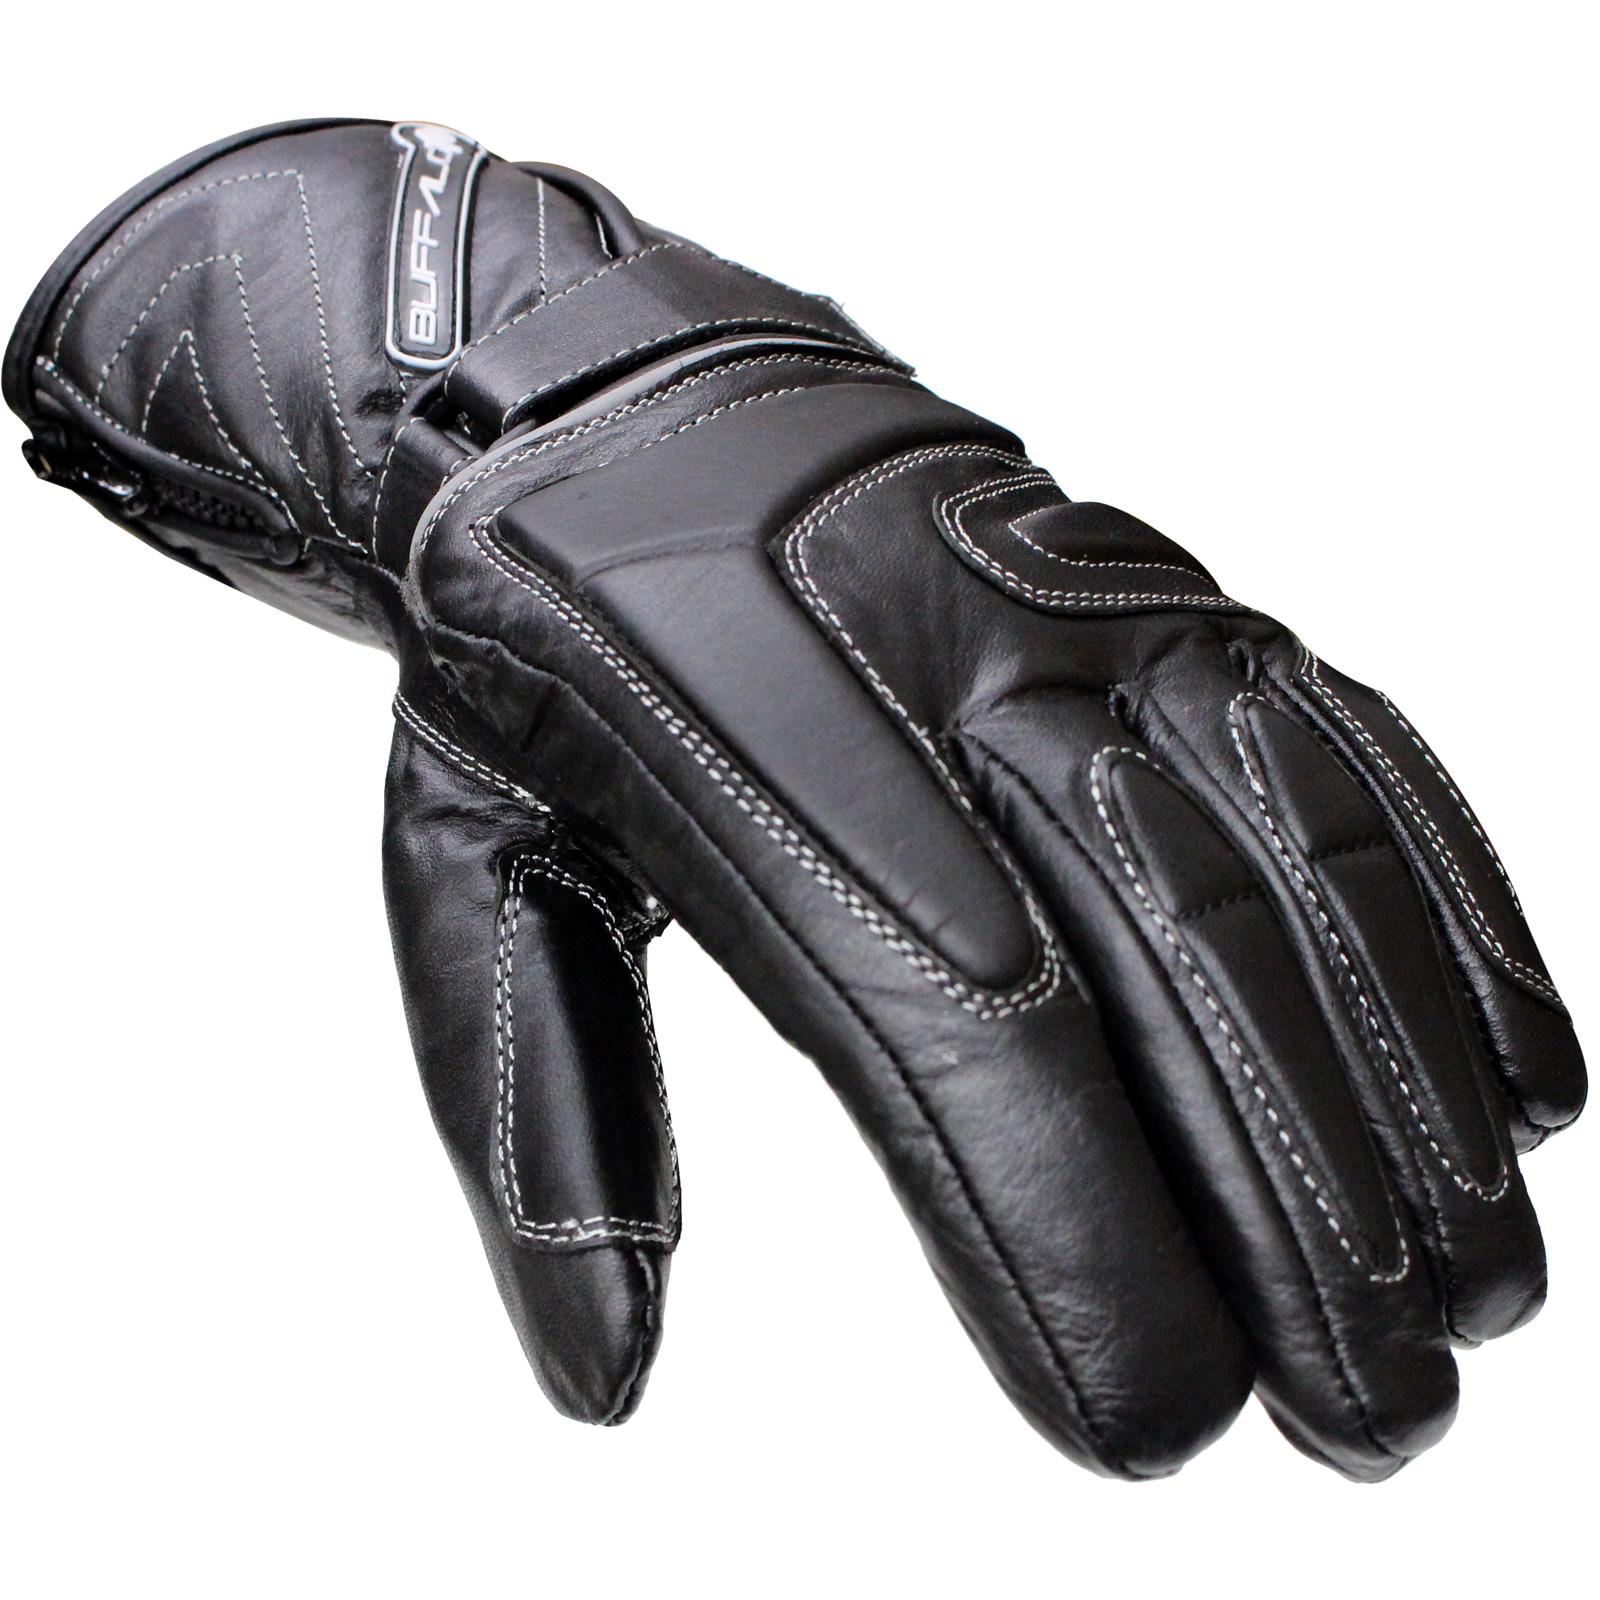 Motorcycle gloves large - Thumbnail 5